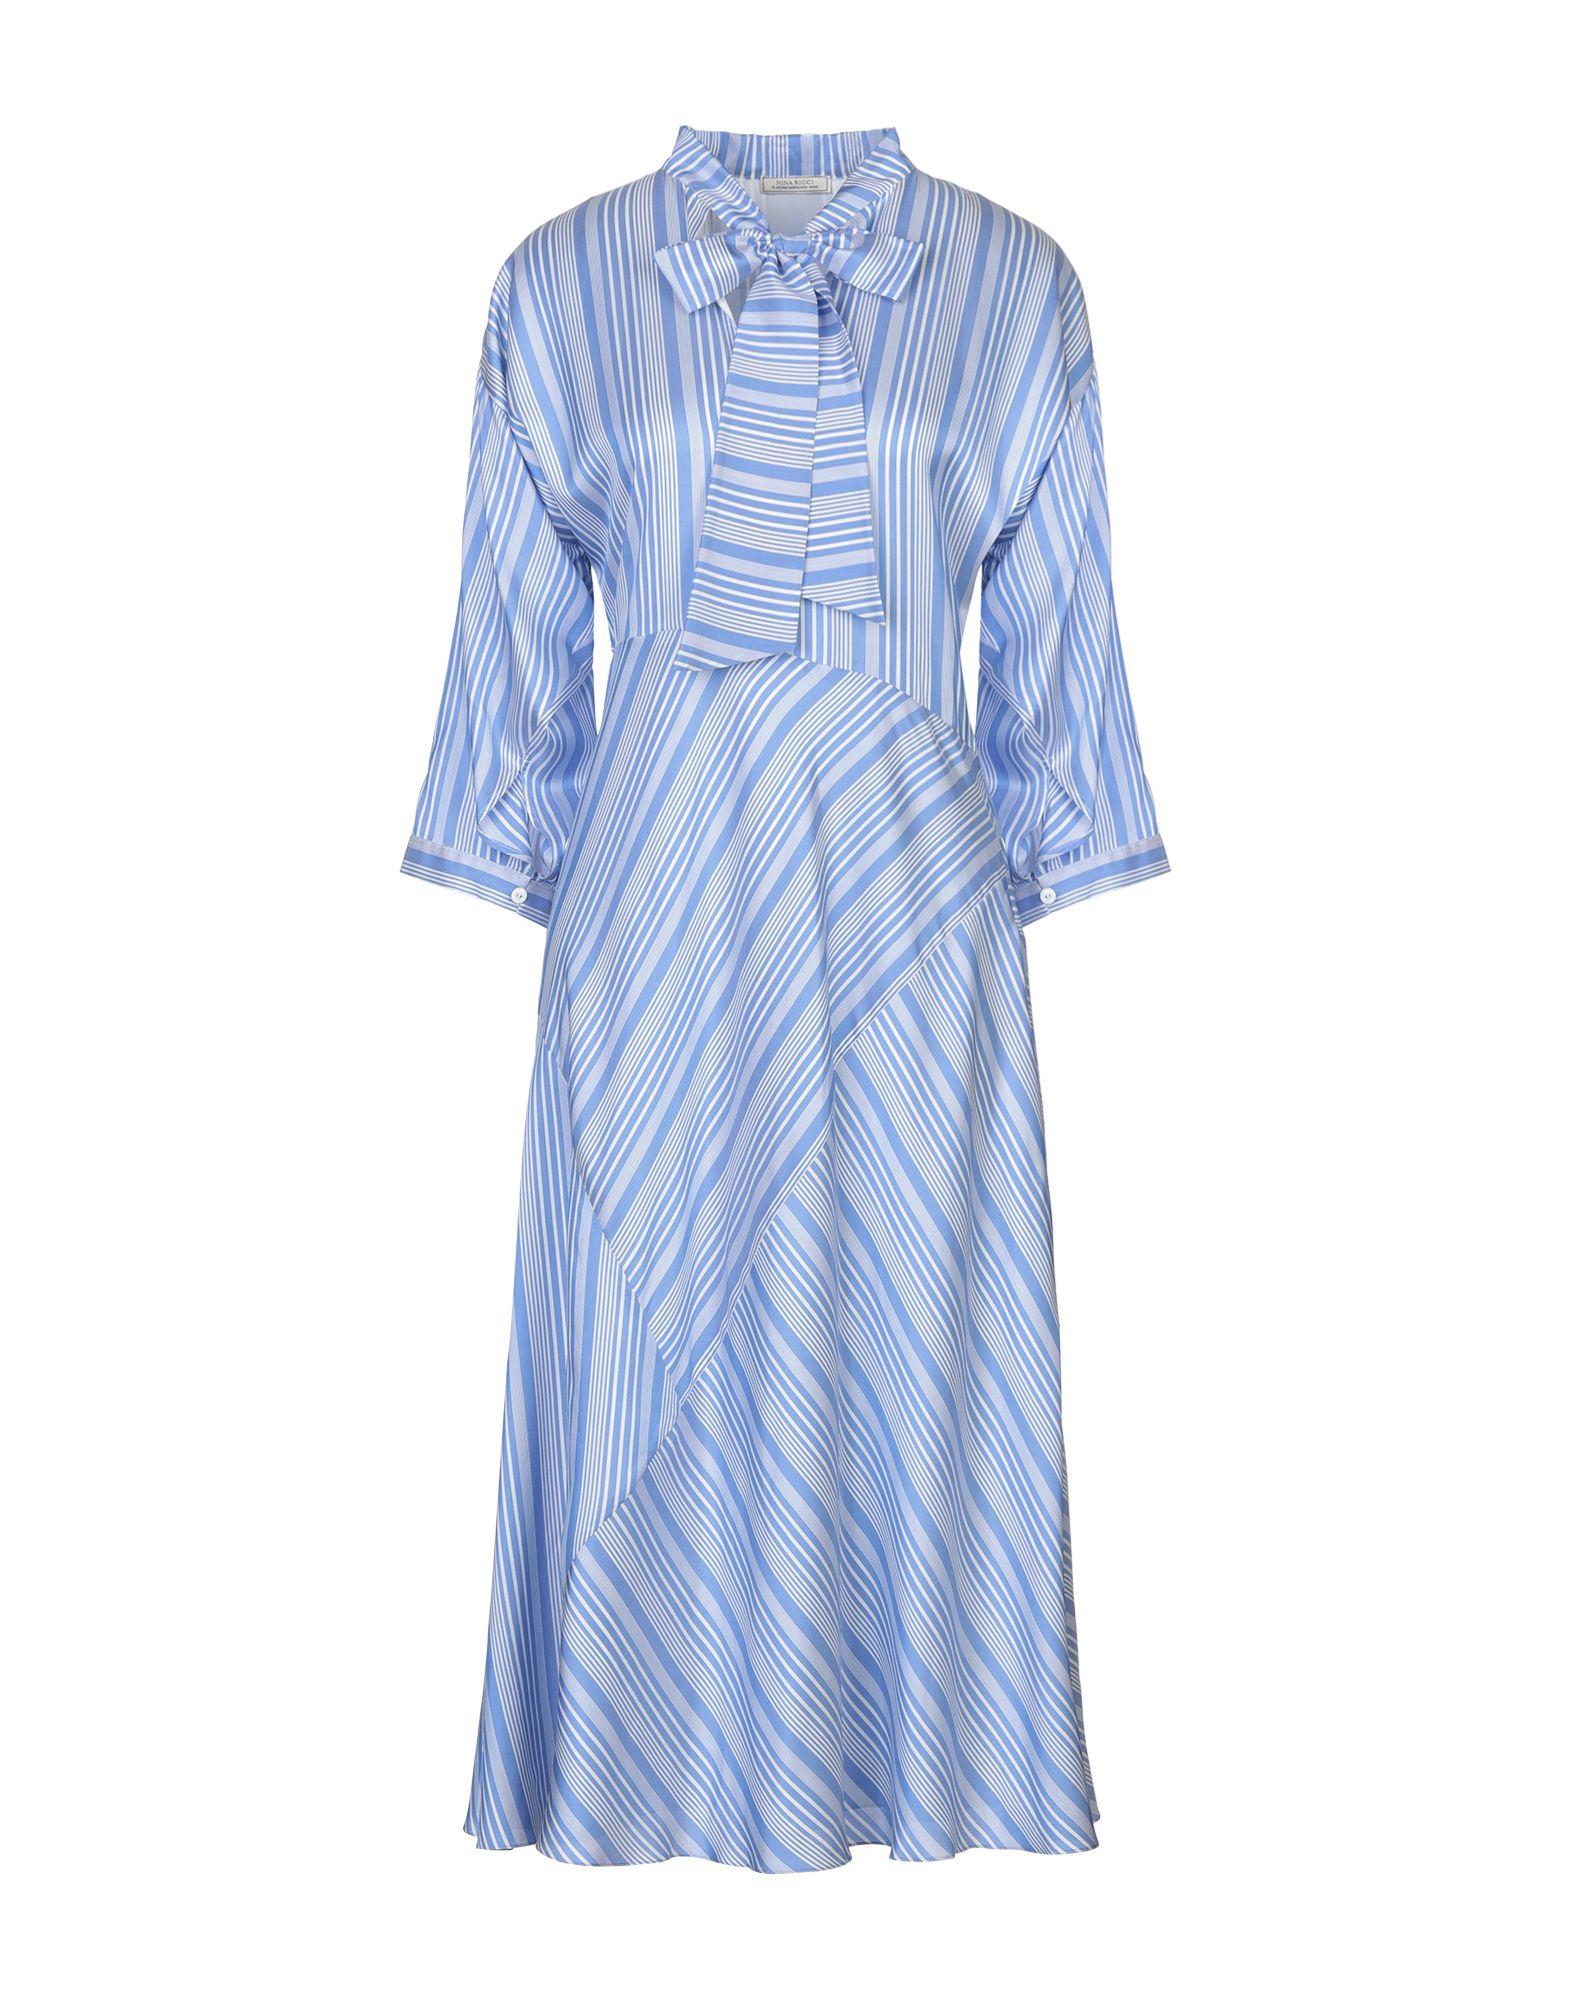 NINA RICCI Платье длиной 3/4 centoquattro платье длиной 3 4